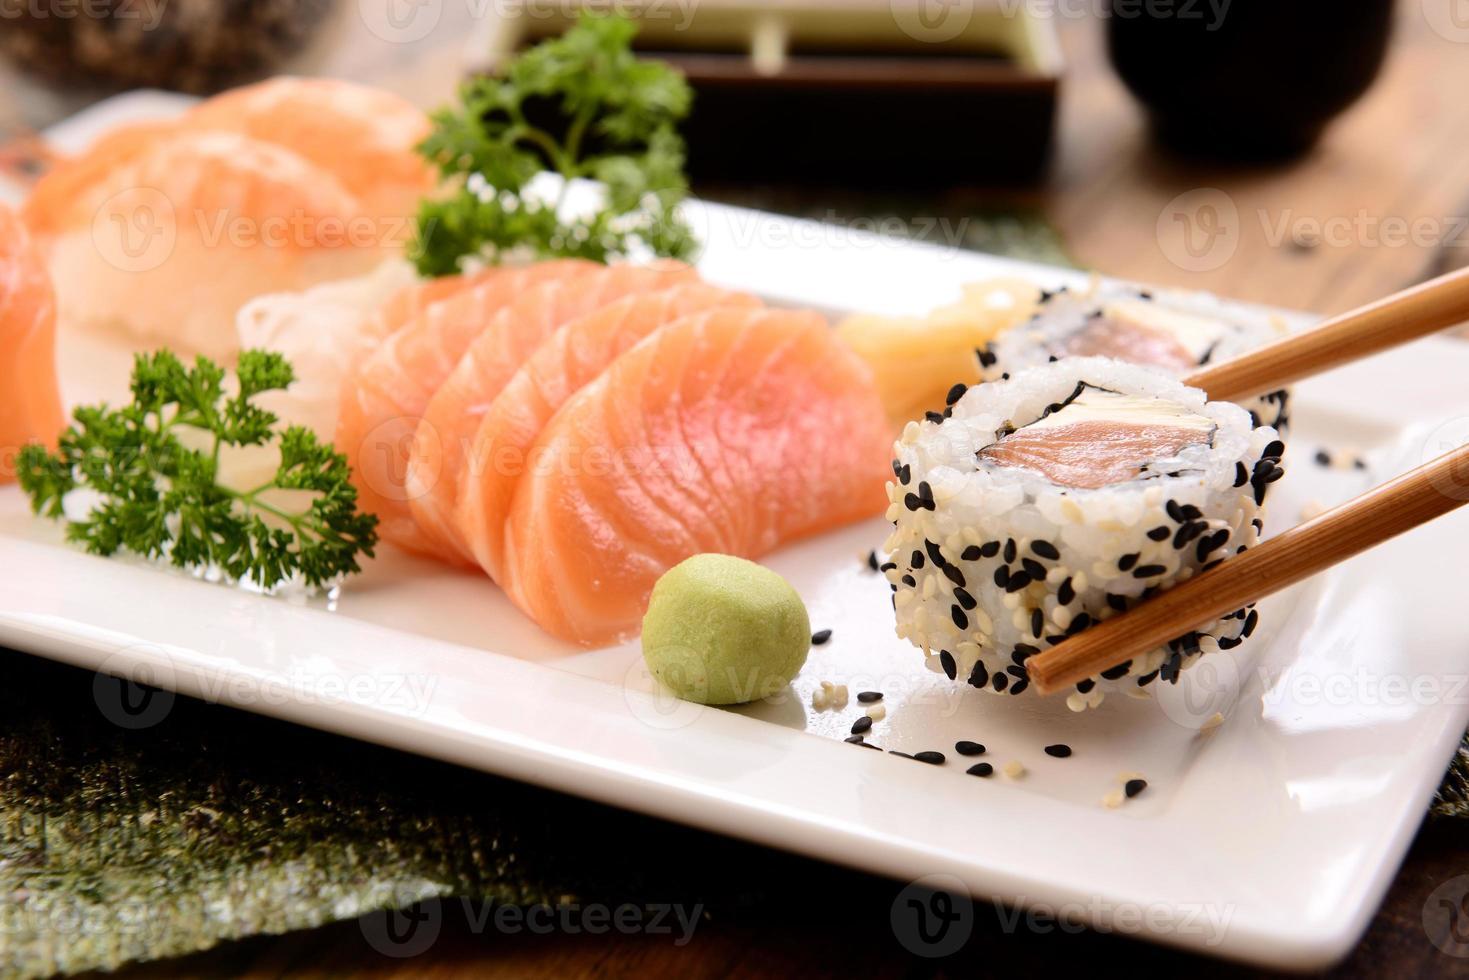 comida japonesa - sashimi y sushi foto